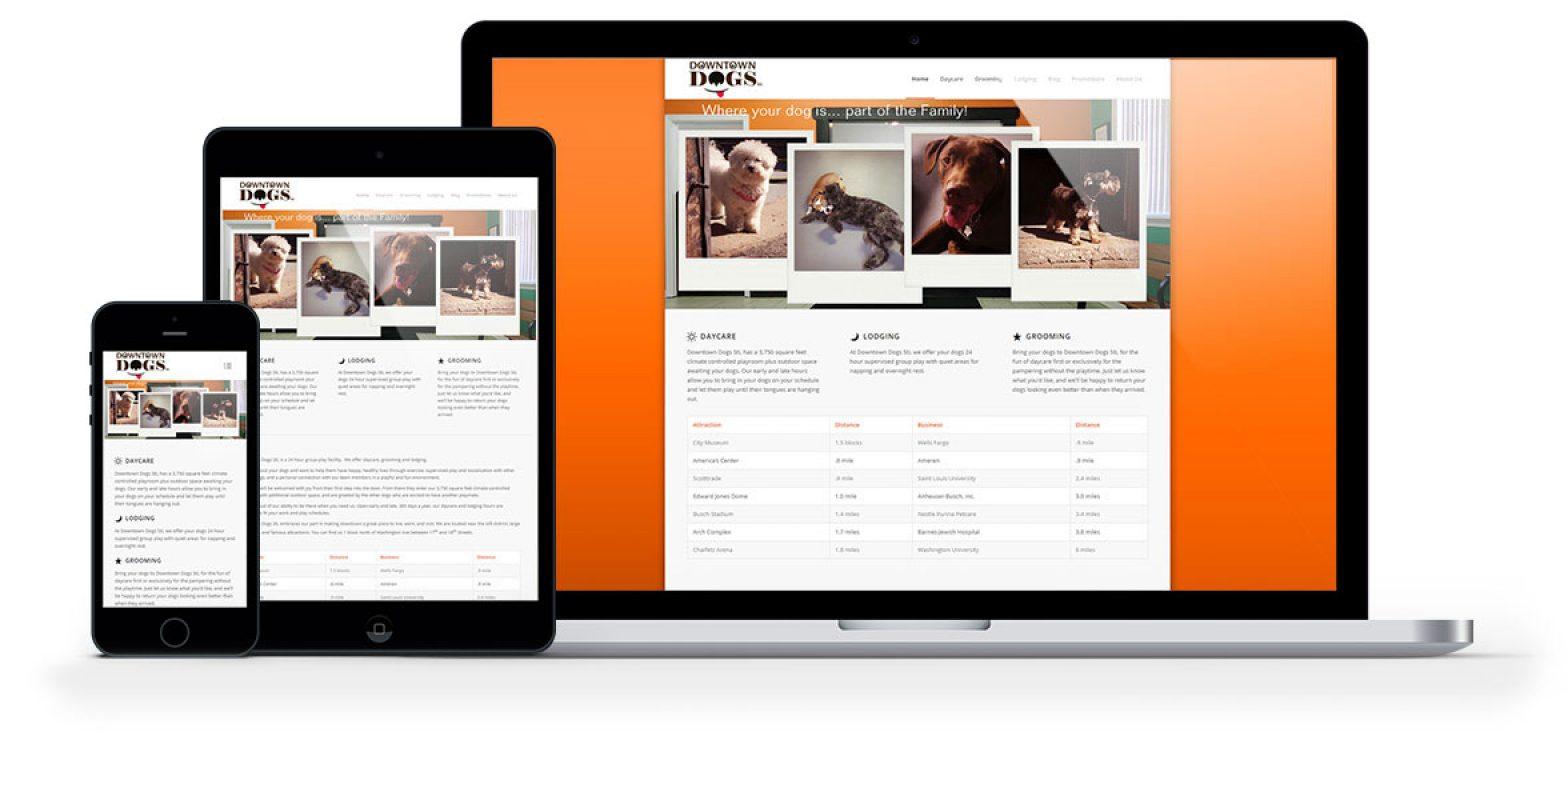 downtown-dogs-website-design-2.jpg